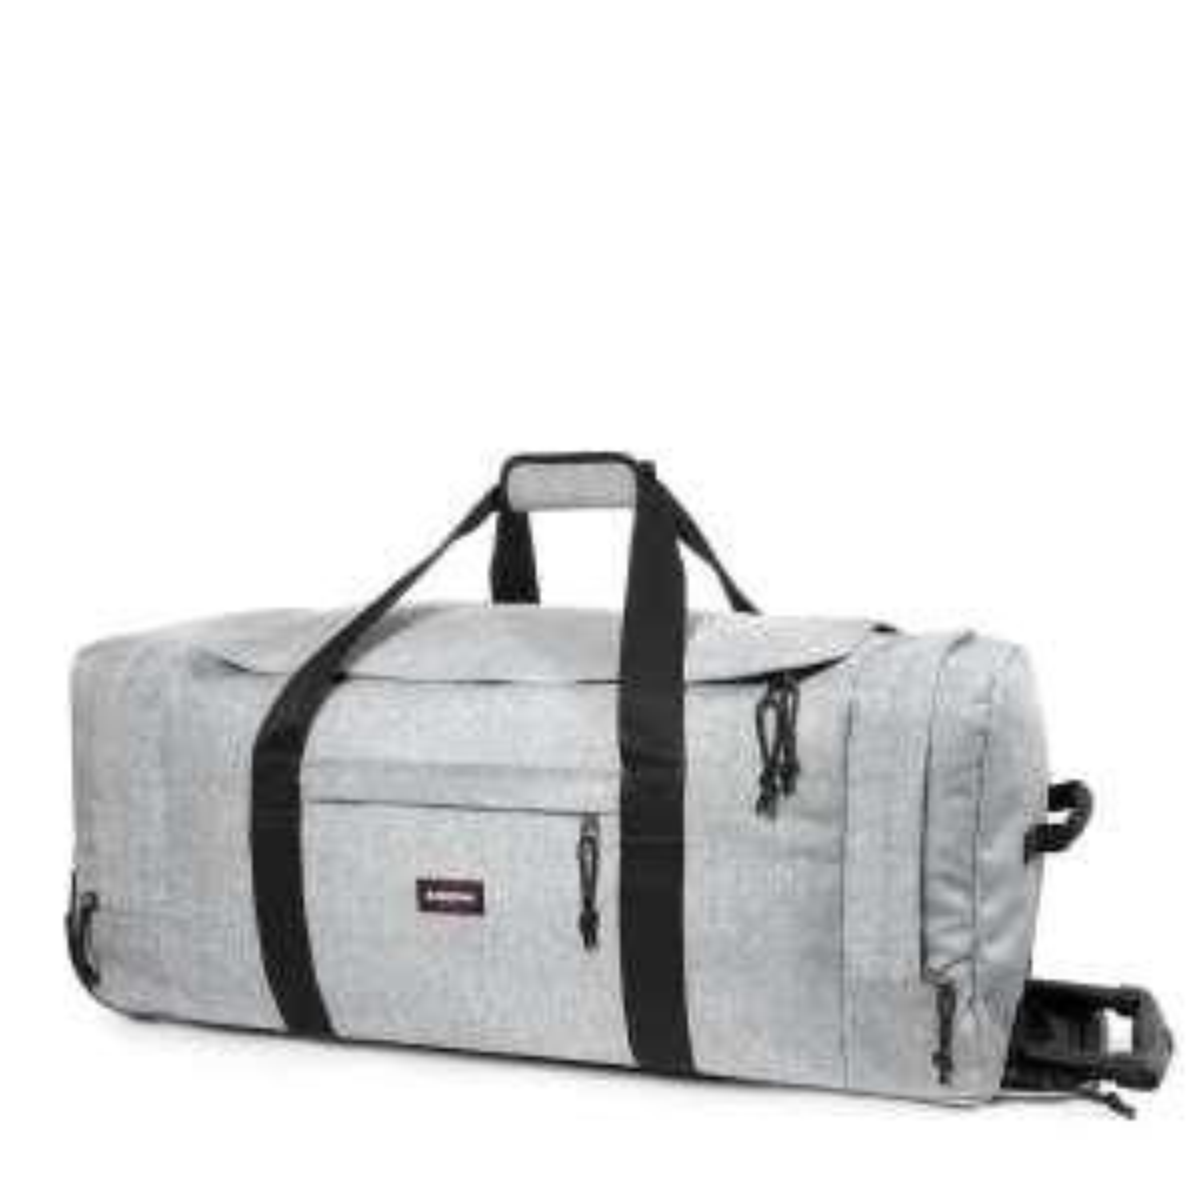 Veel koffers en reistassen in de aanbieding @ Coolblue